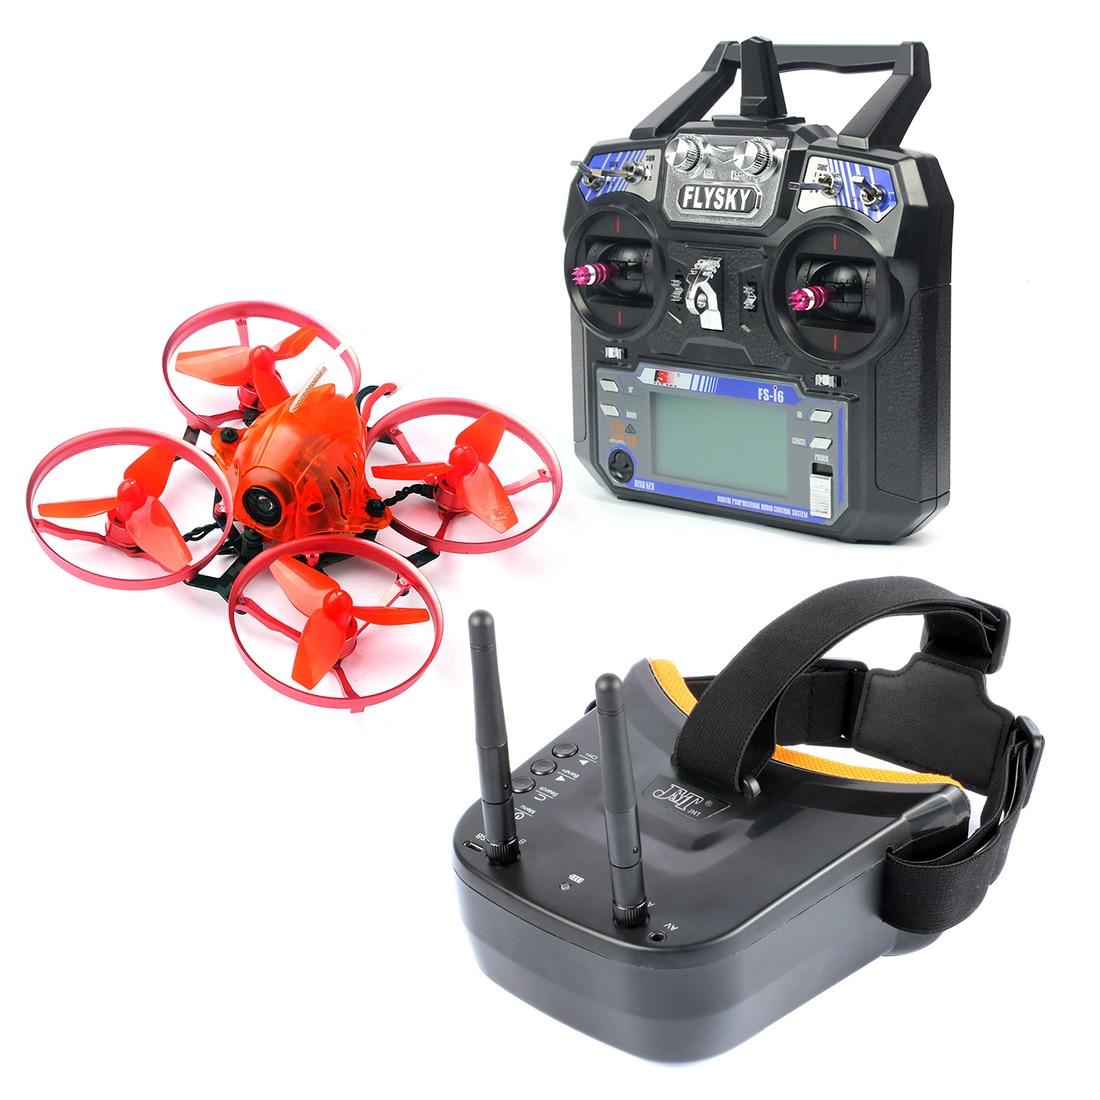 Snapper7 Brushless Micro 75mm 5.8G FPV Raceing Drone 2.4G 6CH RC Quadcopter RTF 700TVL Camera VTX & Double Antenna Mini Goggles snapper7 brushless micro 75mm 5 8g fpv racer drone 2 4g 6ch rc quadcopter rtf 700tvl camera vtx